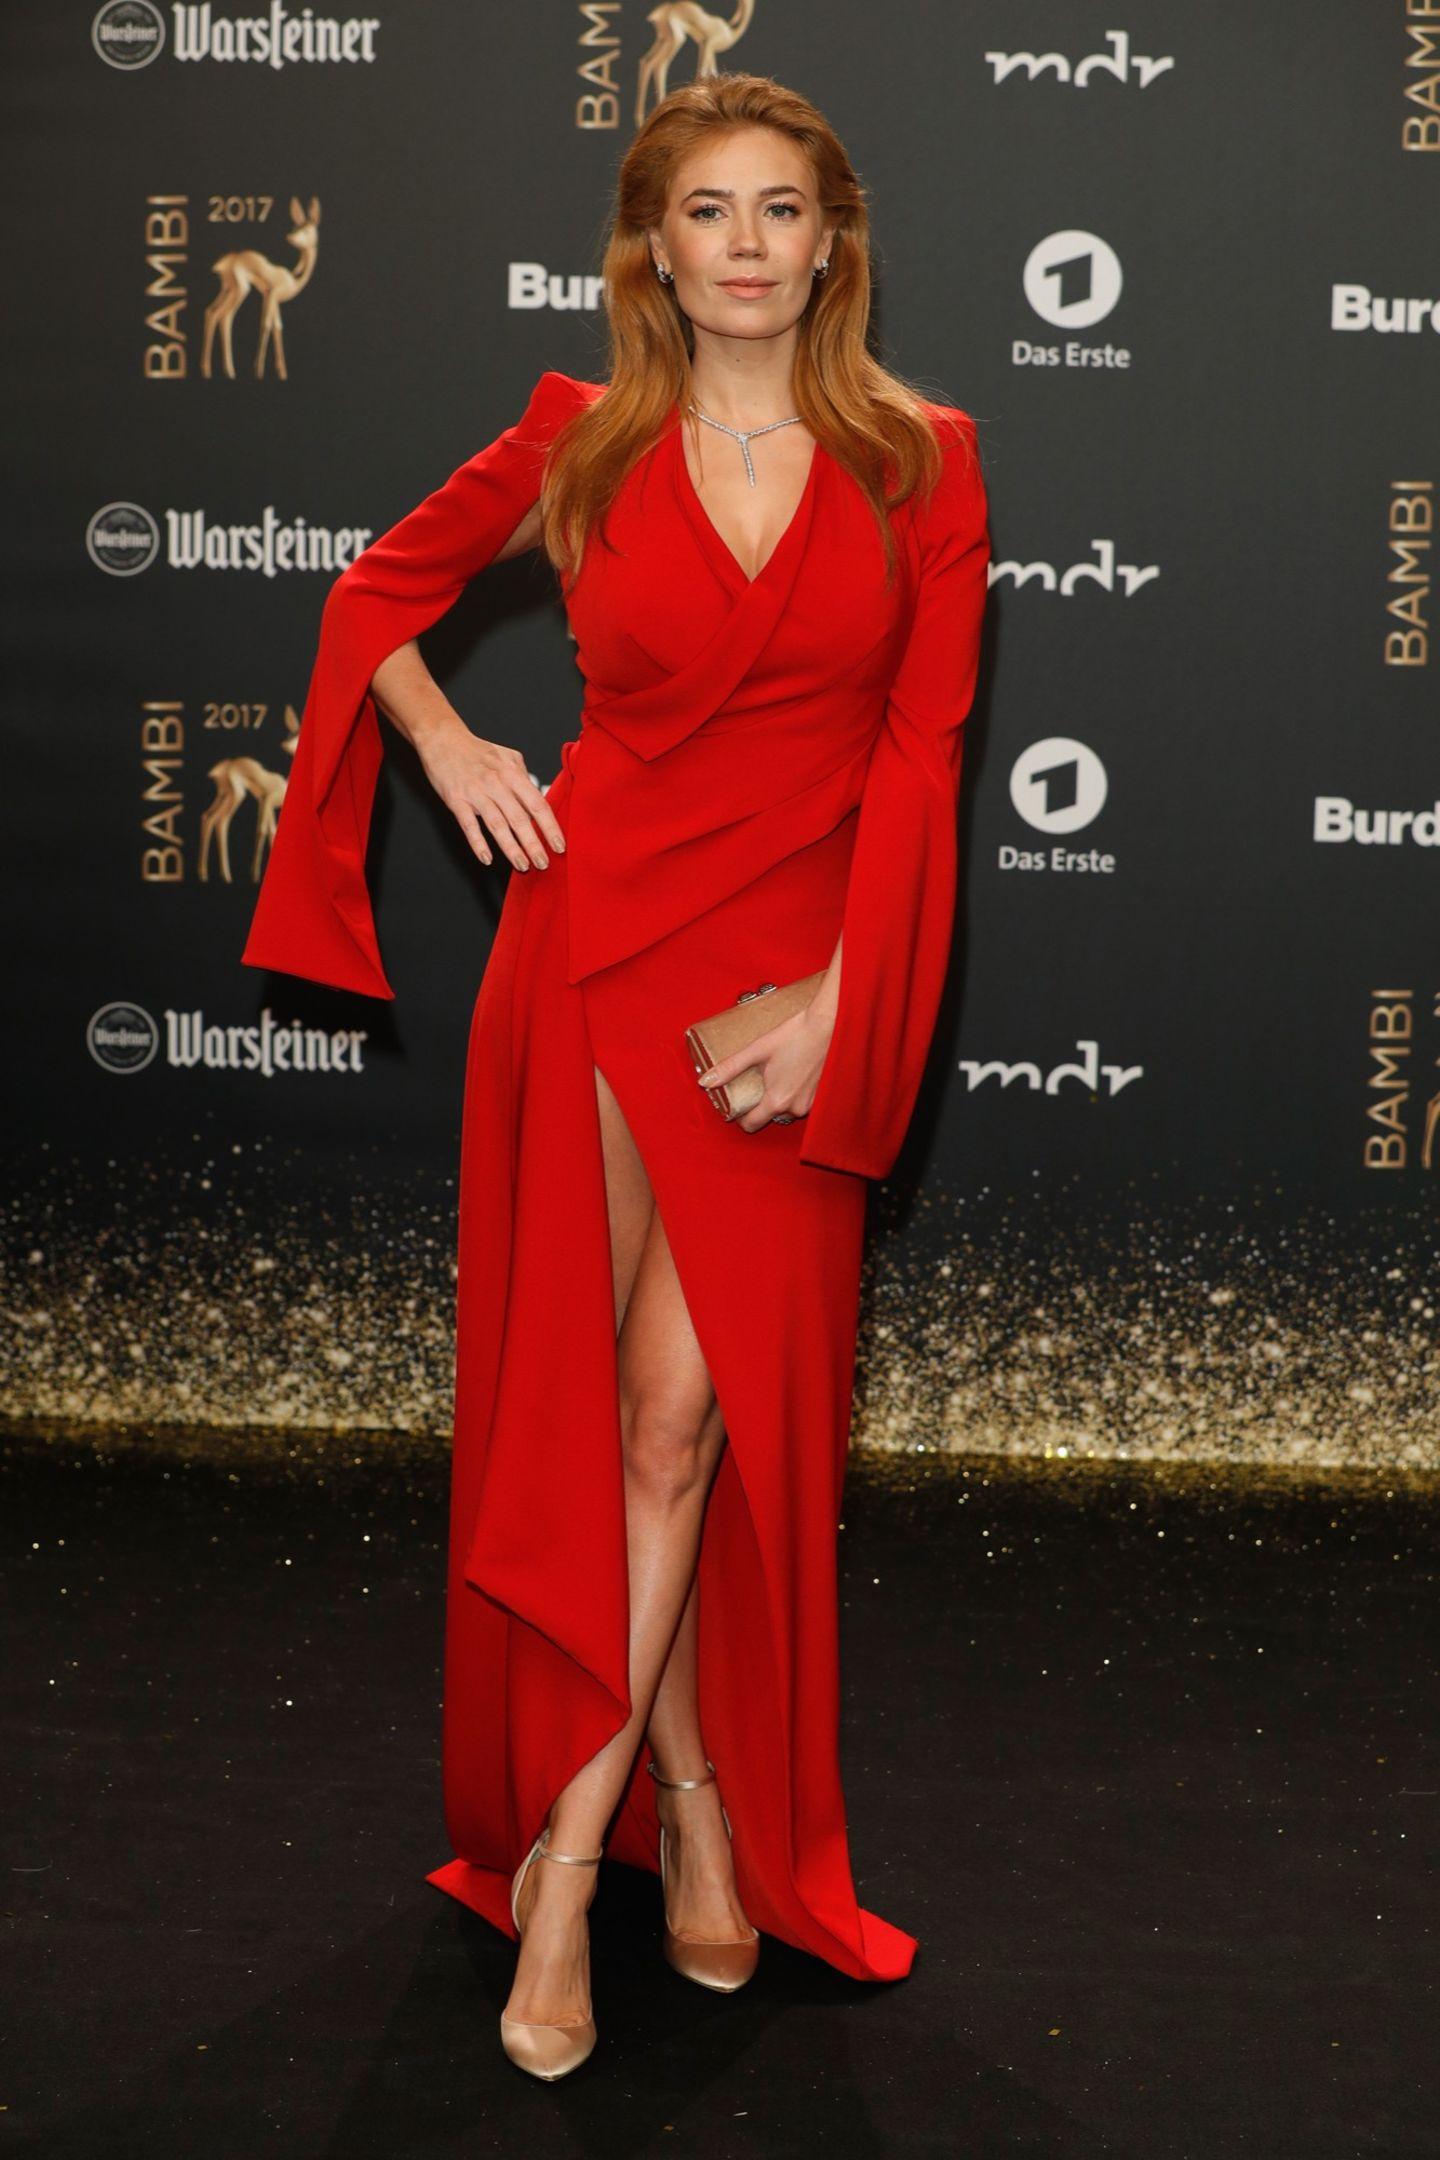 Bambi 2017: Palina Rojinski auf dem Roten Teppich